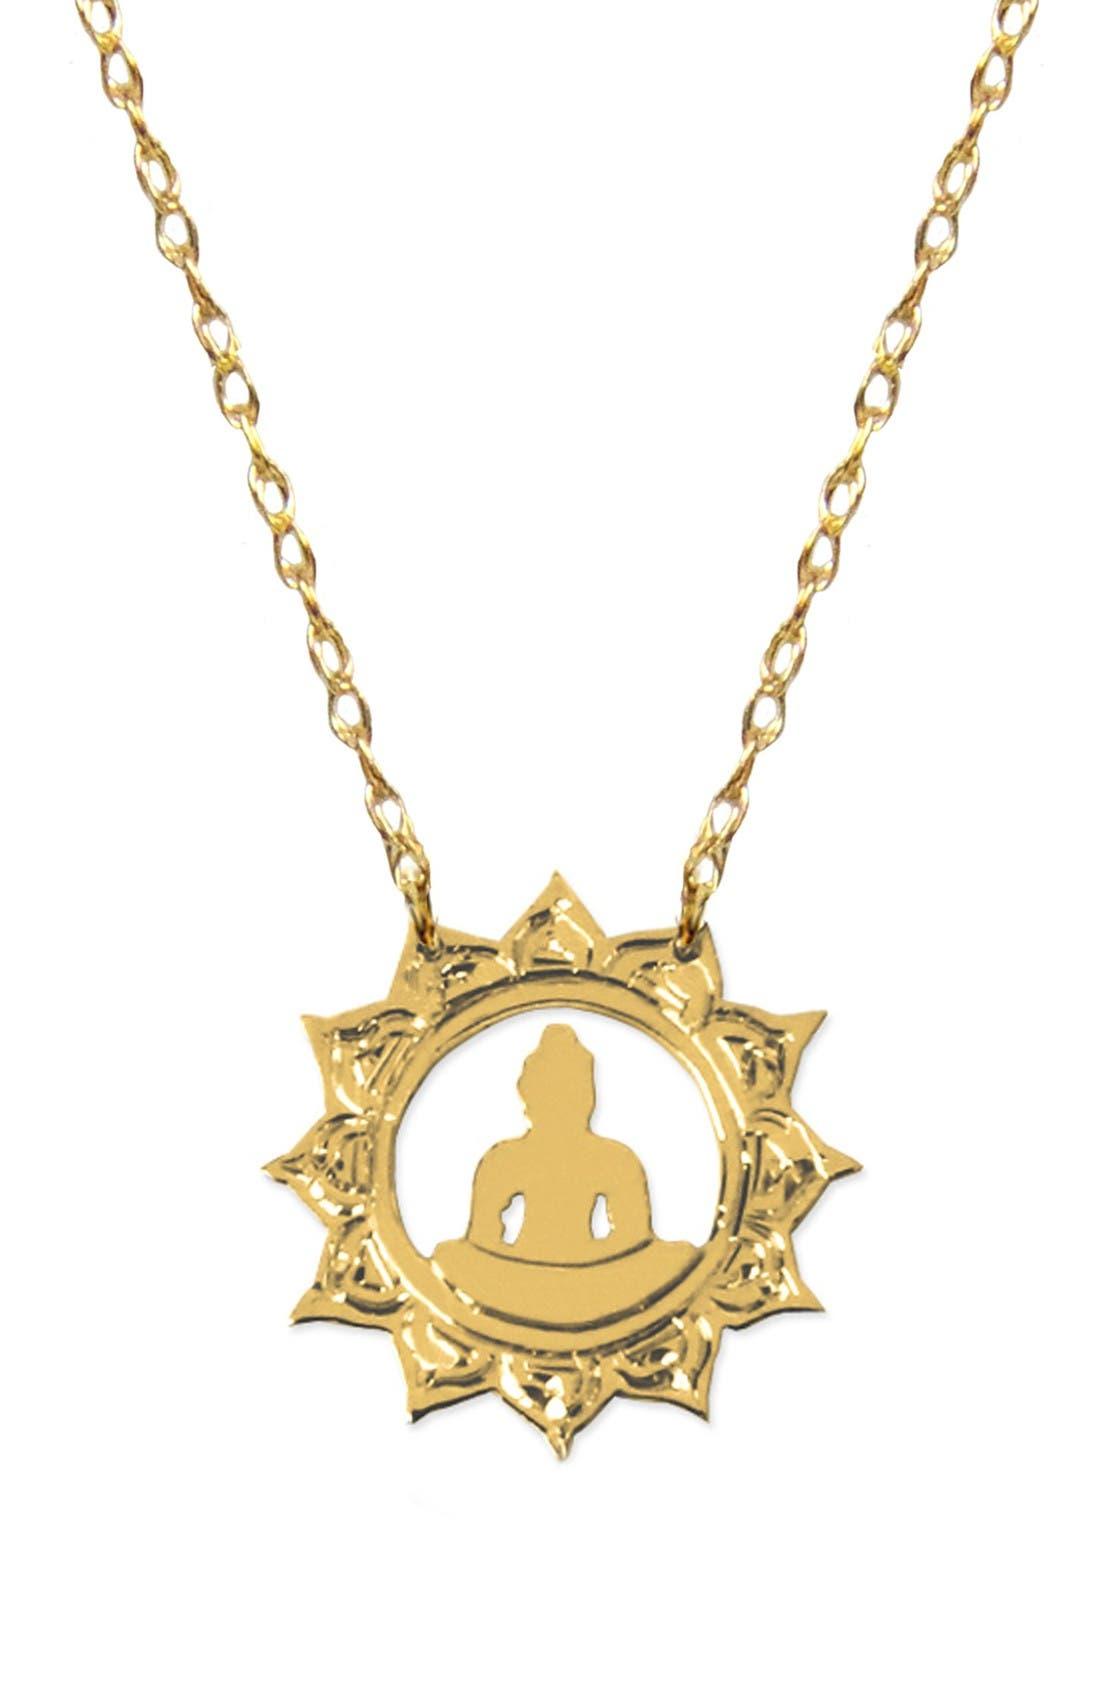 Alternate Image 1 Selected - Jane Basch Designs Buddha Emoji Pendant Necklace (Nordstrom Exclusive)